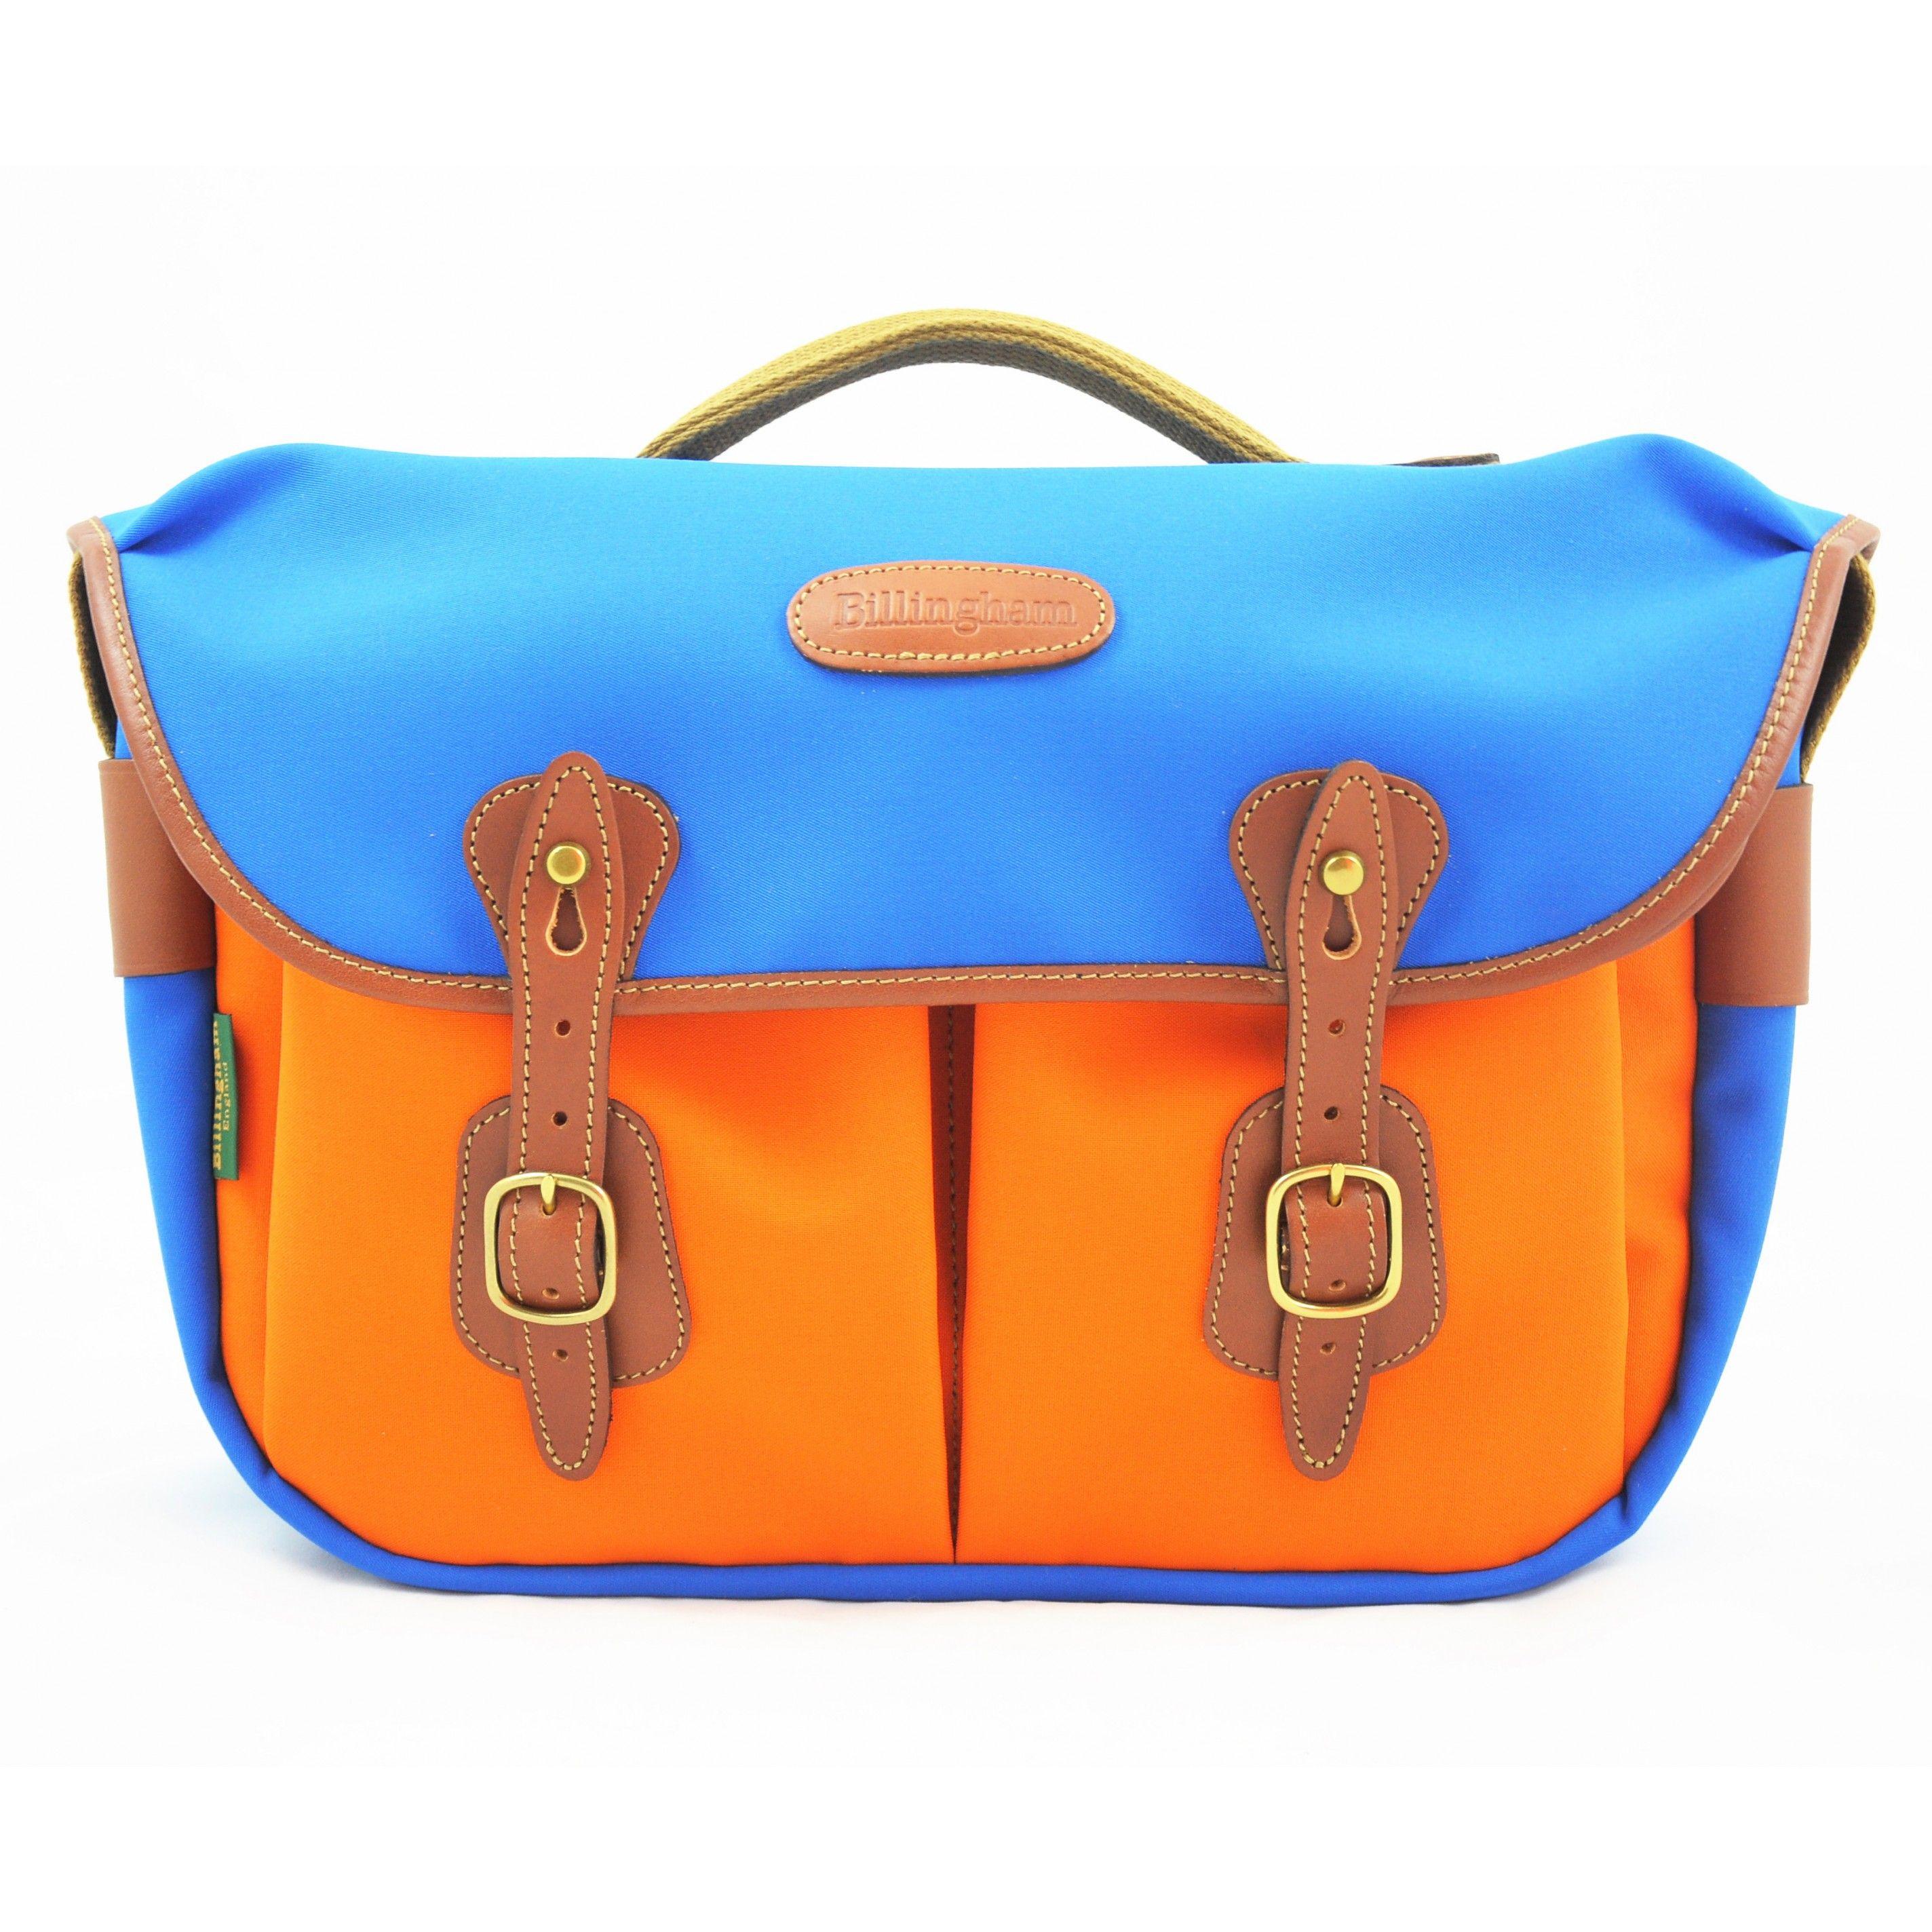 Billingham Hadley Pro Electric Blue Orange X Pedlars Shoulder Bag Khaki Chocolate Leather Bags